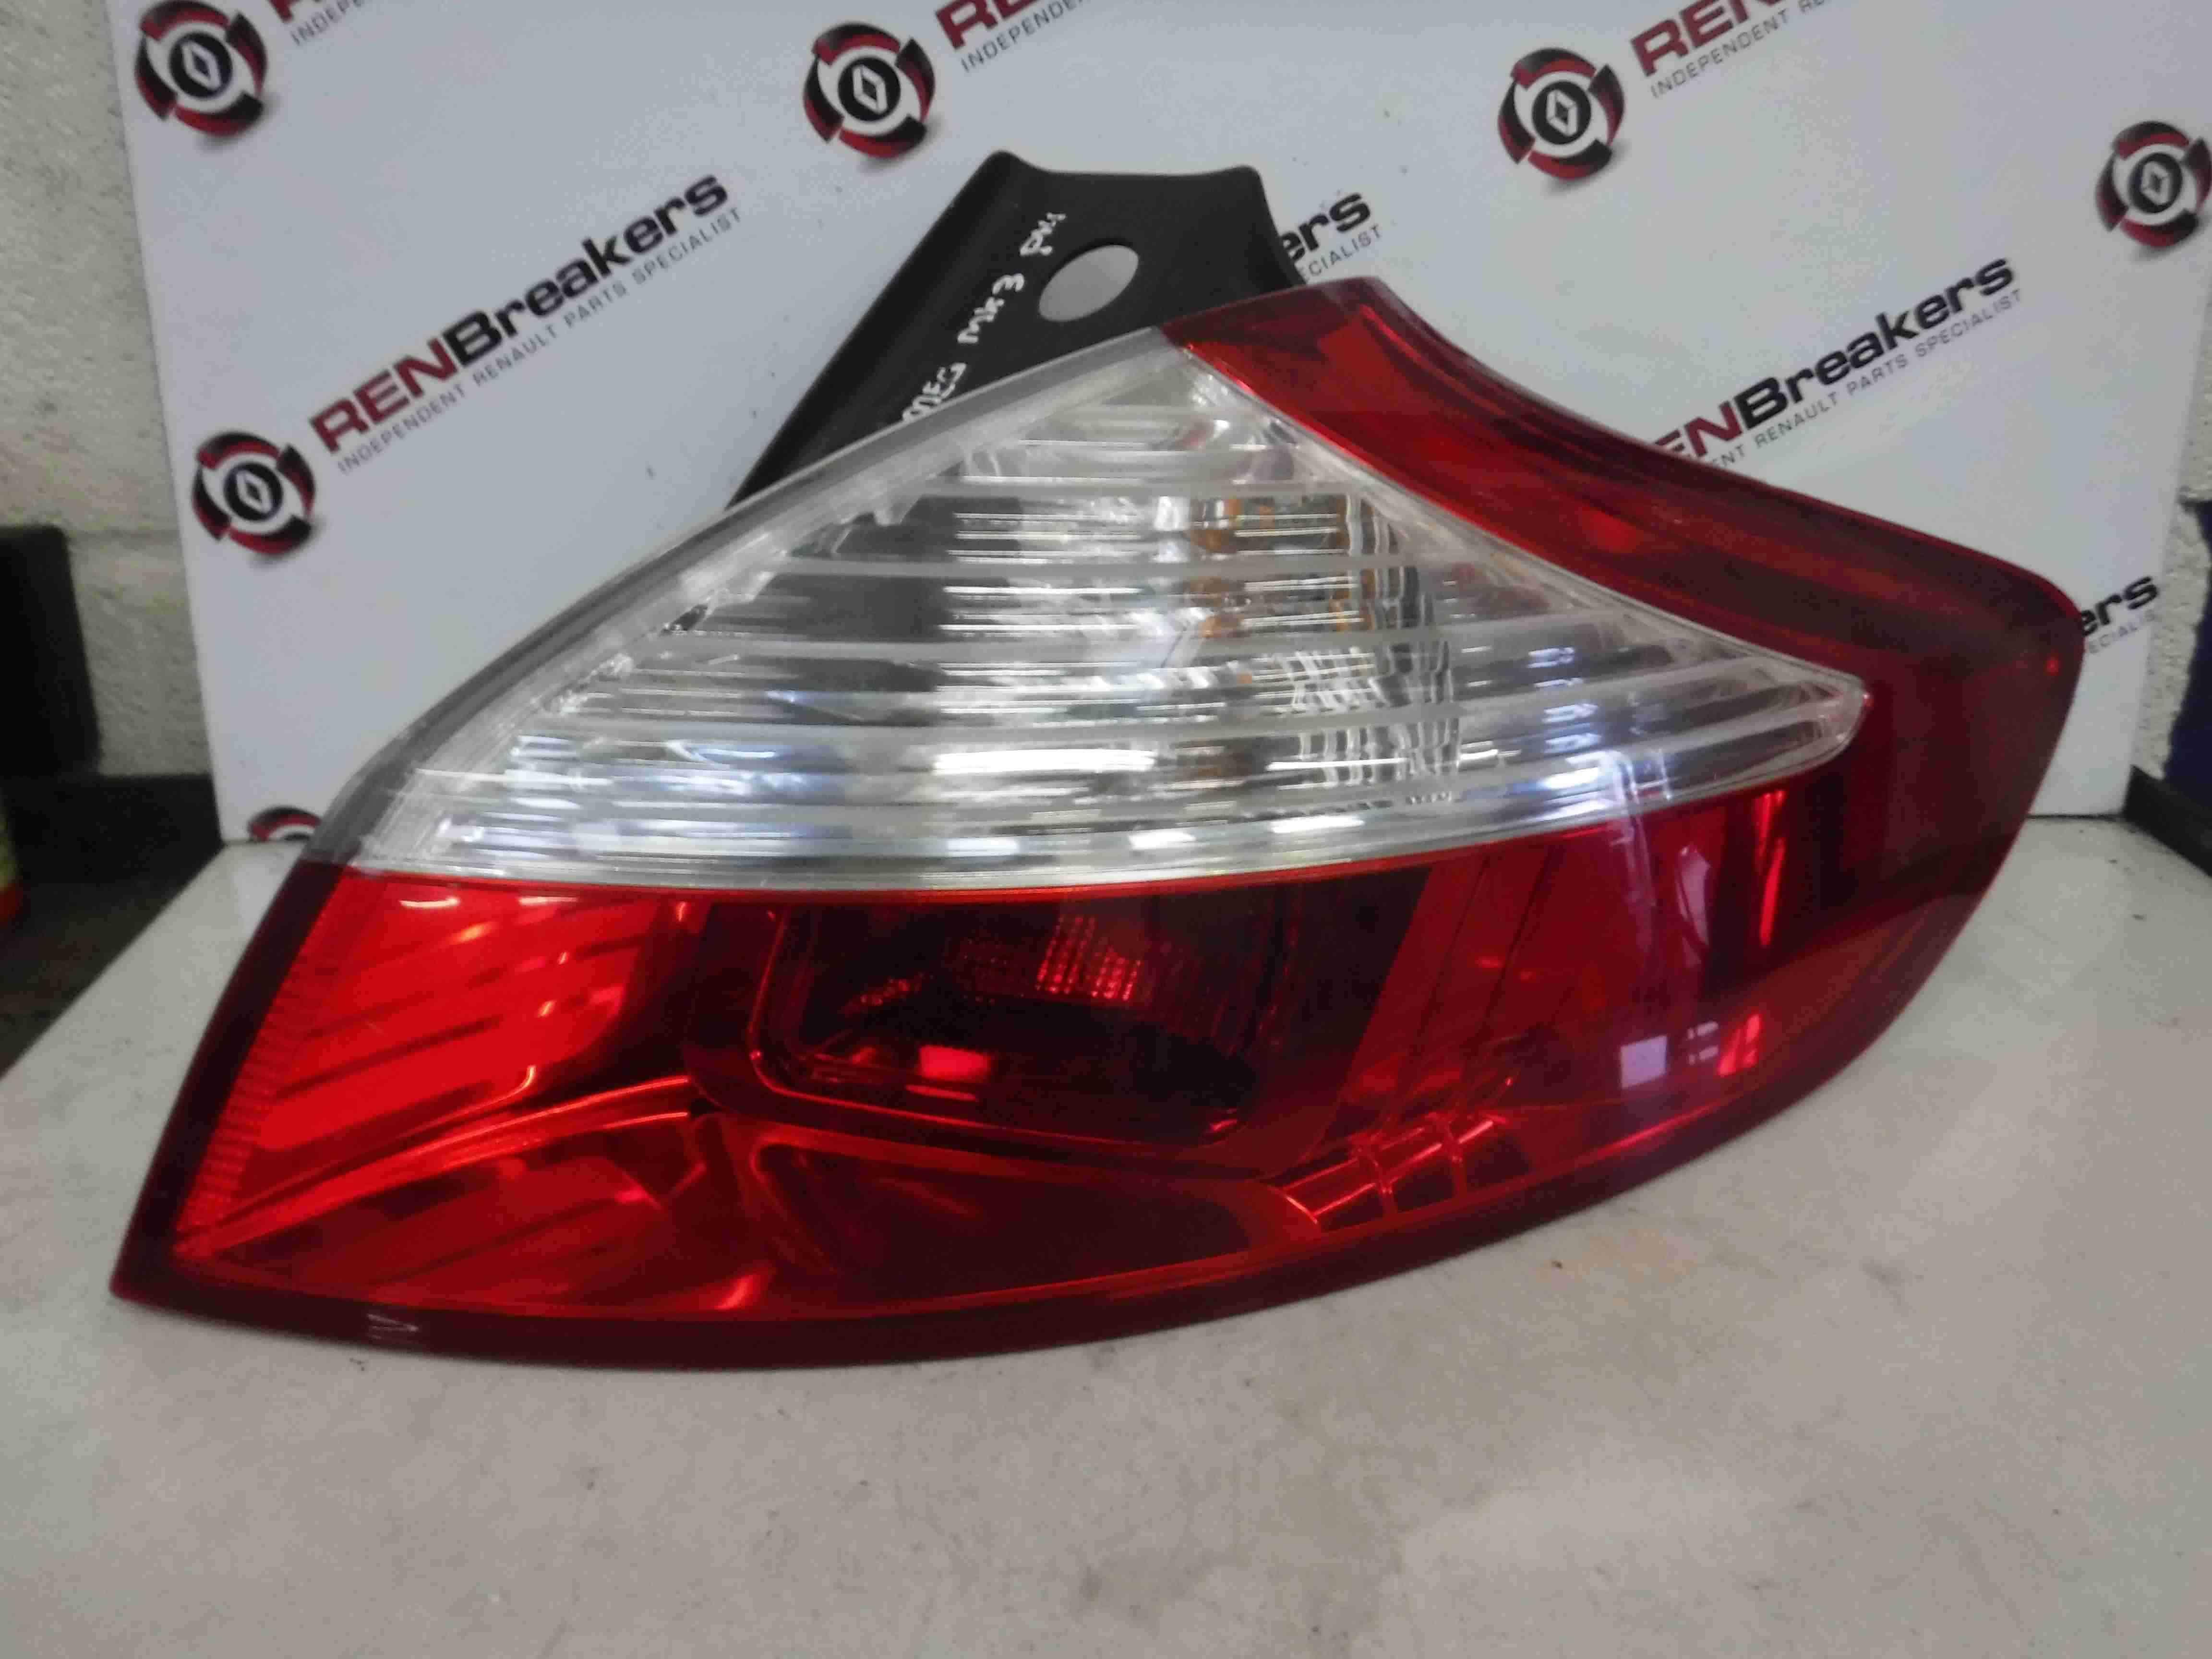 Renault Megane MK3 2008-2014 Drivers OSR Rear Body Light 265500007r